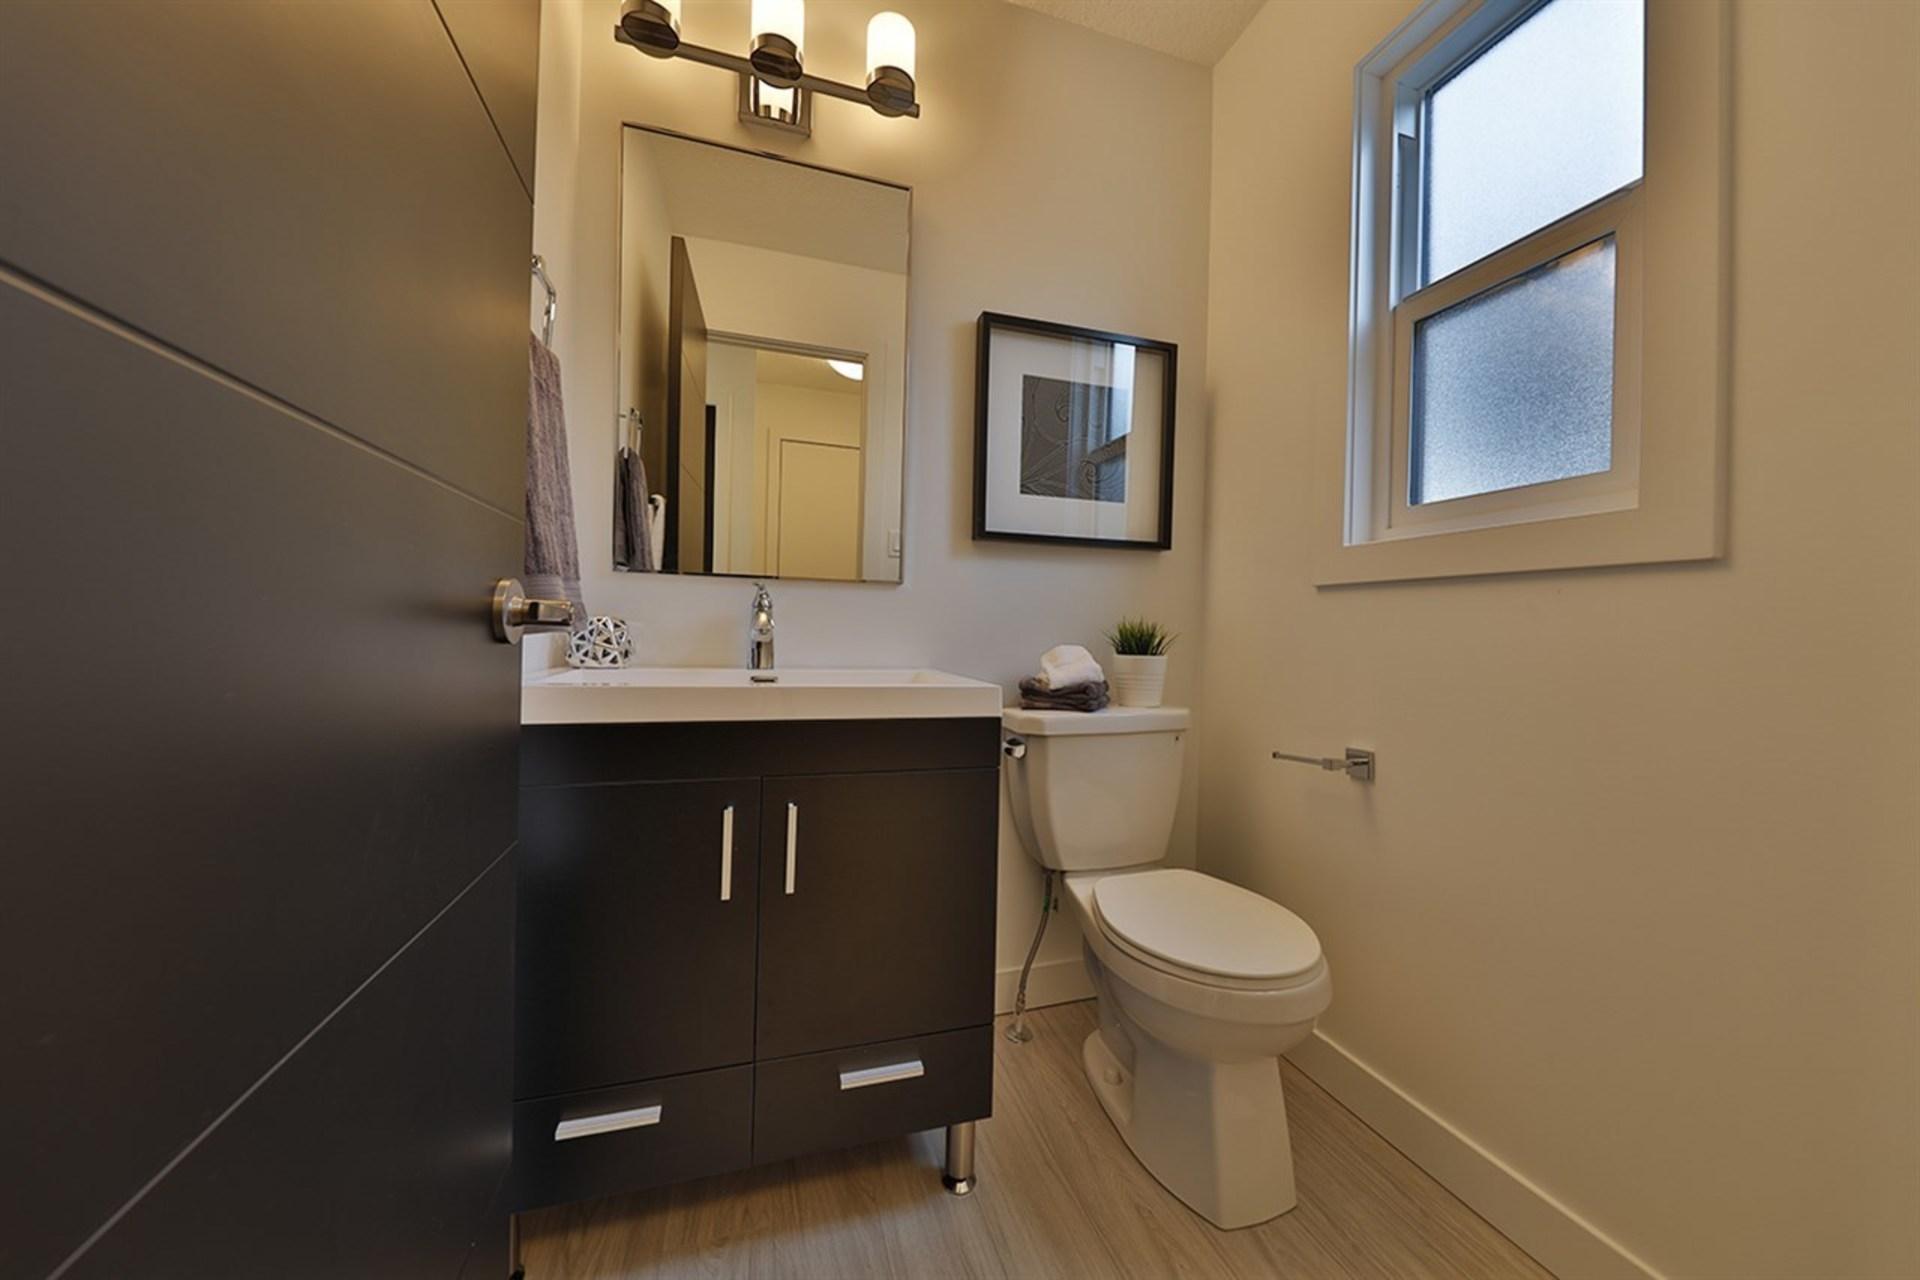 12037-93-street-alberta-avenue-edmonton-06 at 12037 93 Street, Alberta Avenue, Edmonton